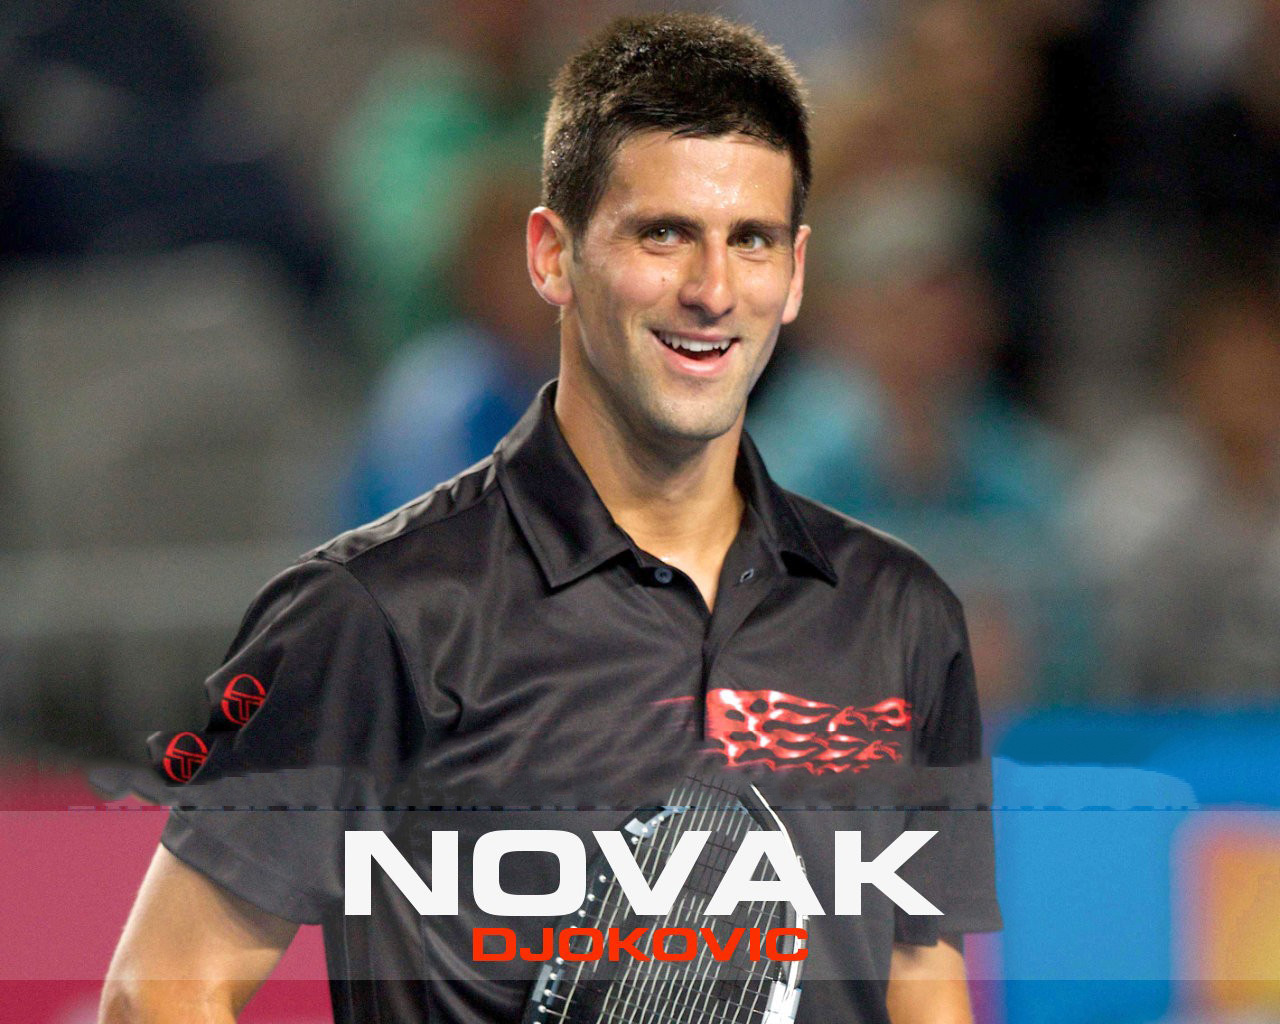 Novak Djokovic Wallpapers Pictures 9 Novak Djokovic Wallpapers Image 1280x1024